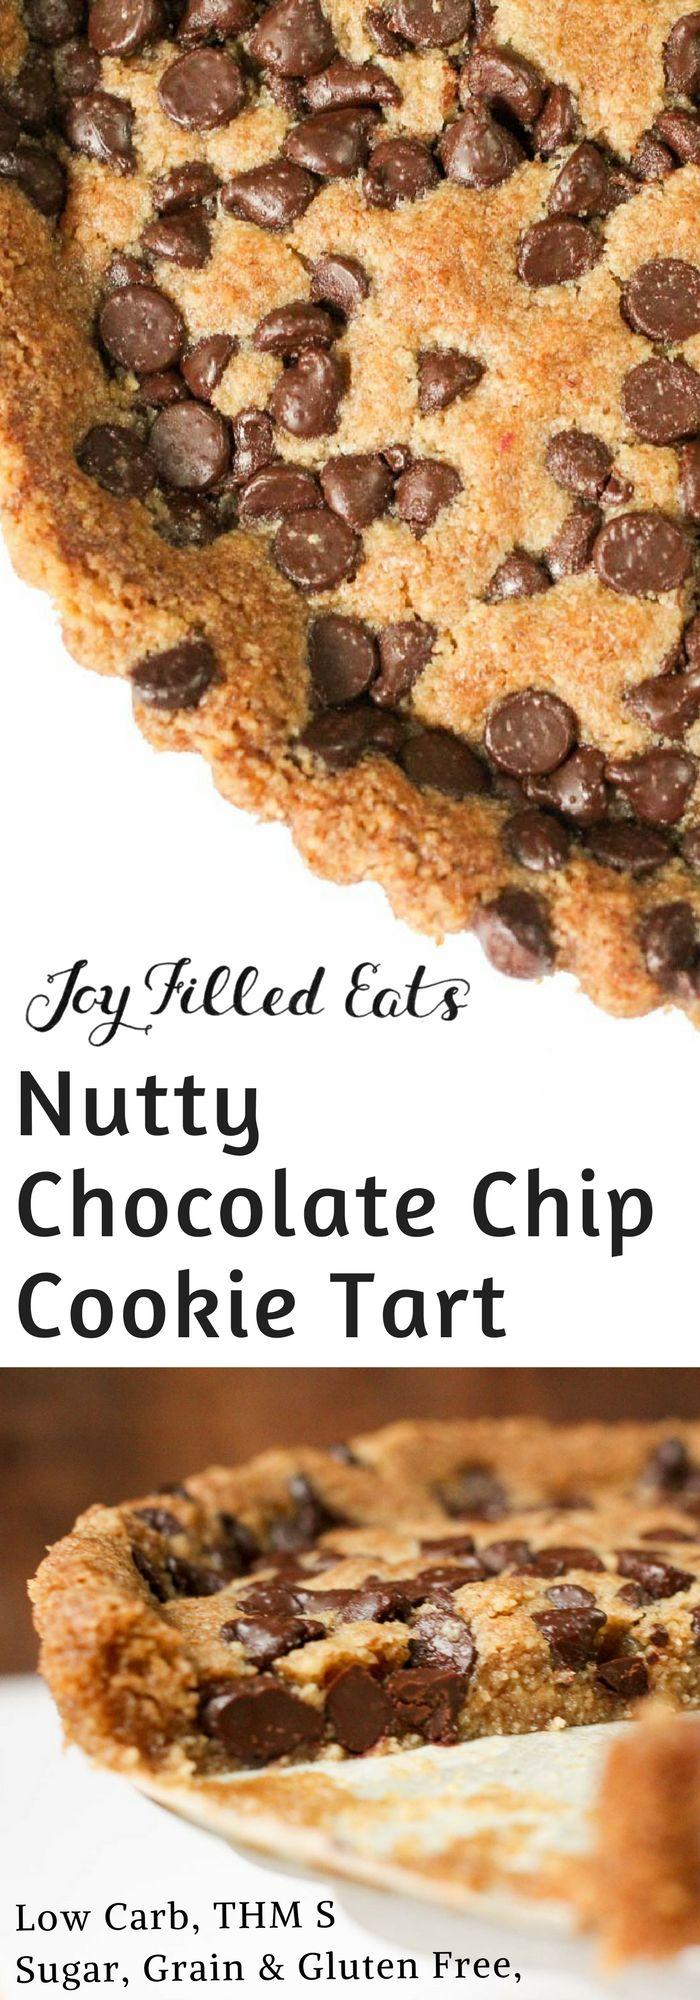 Nutty Chocolate Chip Cookie Tart - Low Carb, Grain Gluten Sugar Free, THM S, 6 ingredients, keto, fast, easy dessert